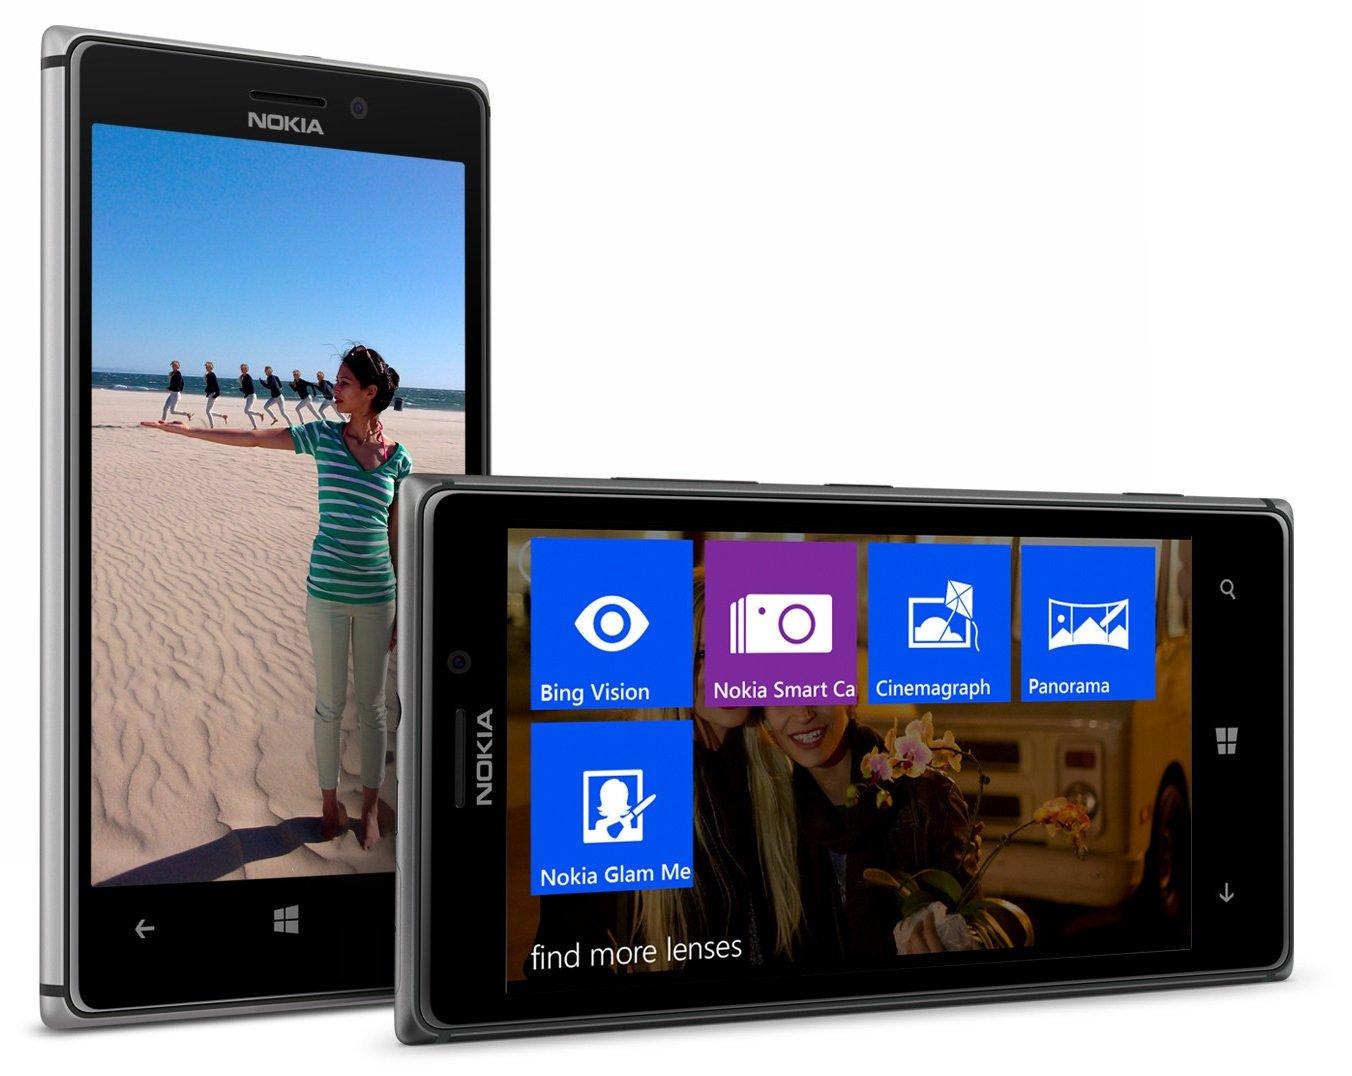 Nokia lumia 925 jpg - Amazon Com Nokia Lumia 925 16gb Unlocked Gsm 4g Lte Windows 8 Smartphone W 8mp Camera Black At T No Warranty Cell Phones Accessories